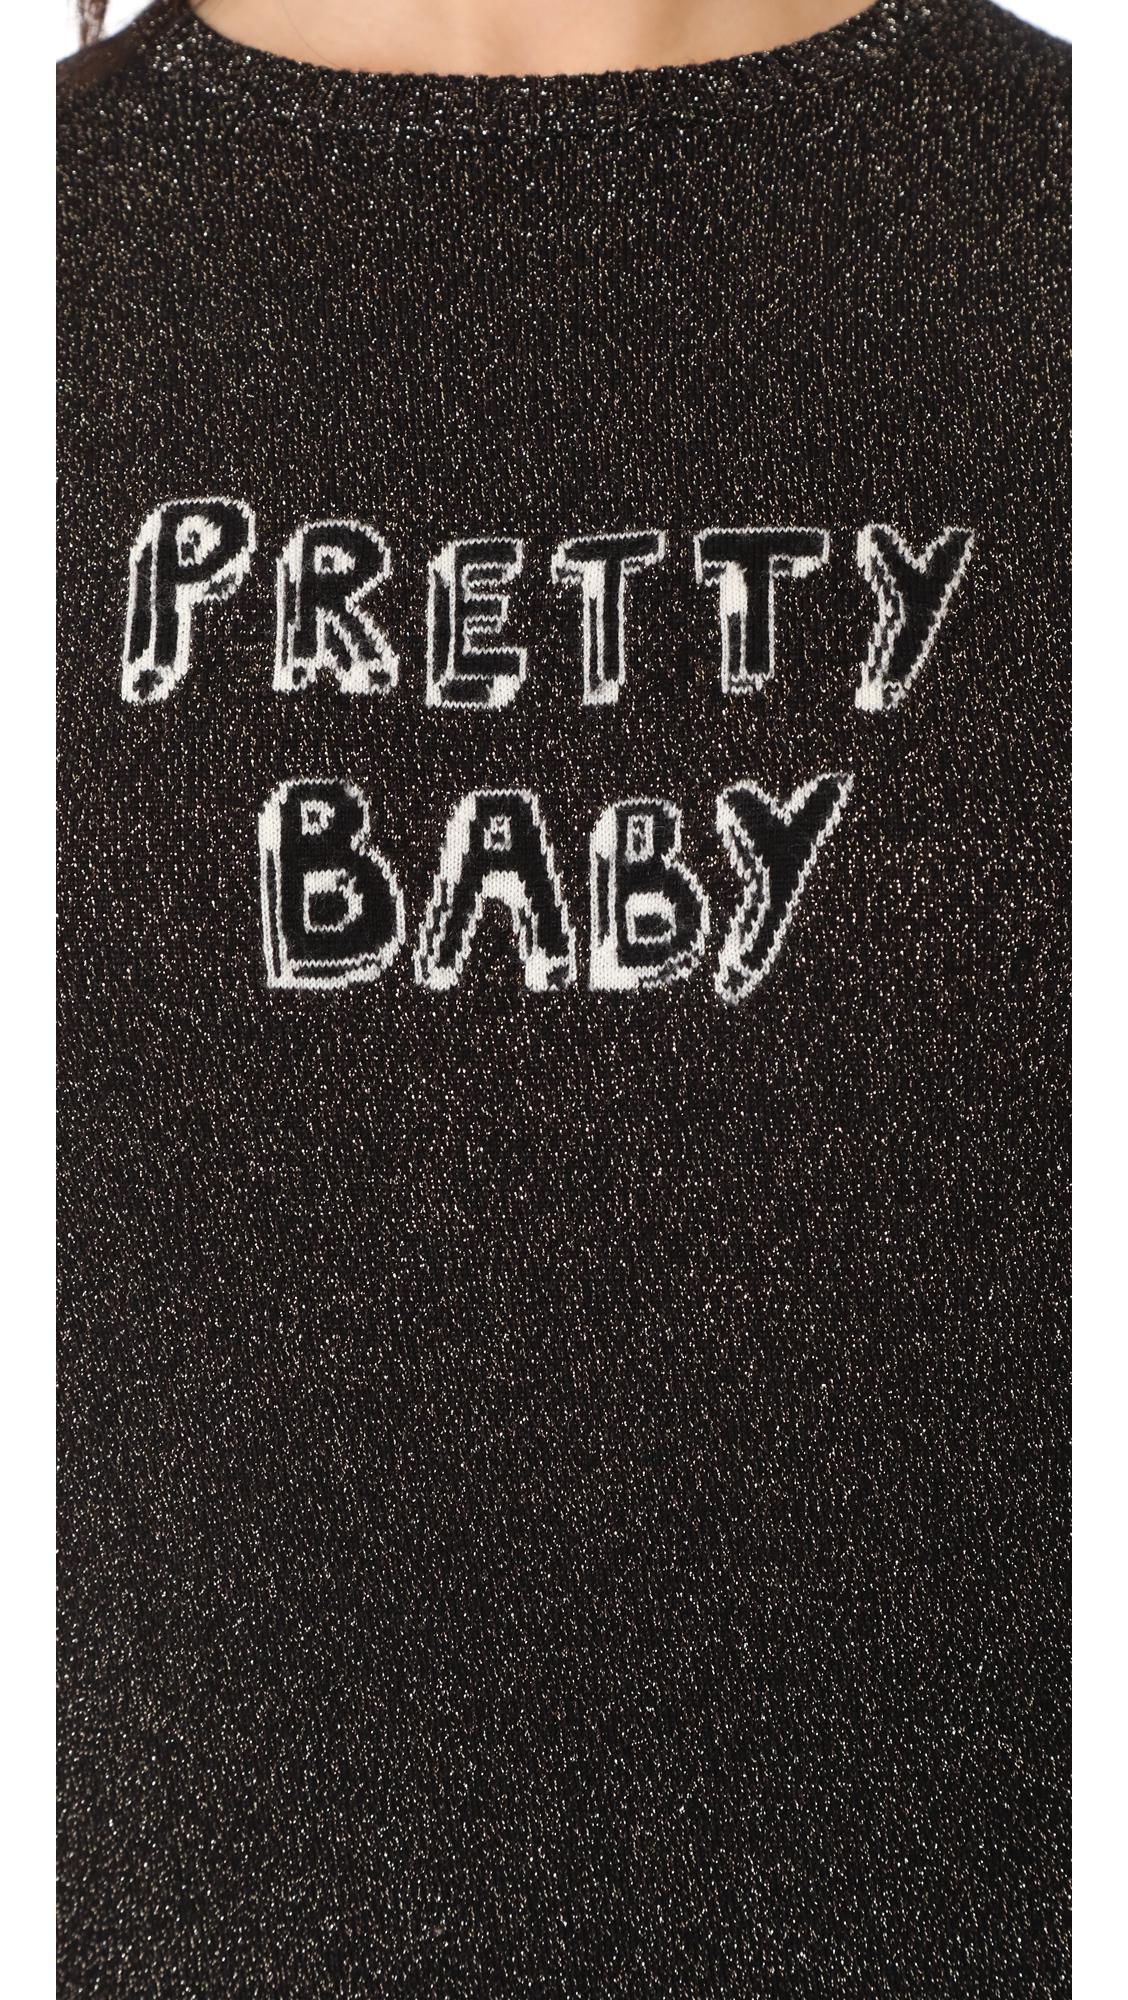 2635d43b2 J Brand X Bella Freud Sparkle Pretty Baby Jumper in Black - Lyst